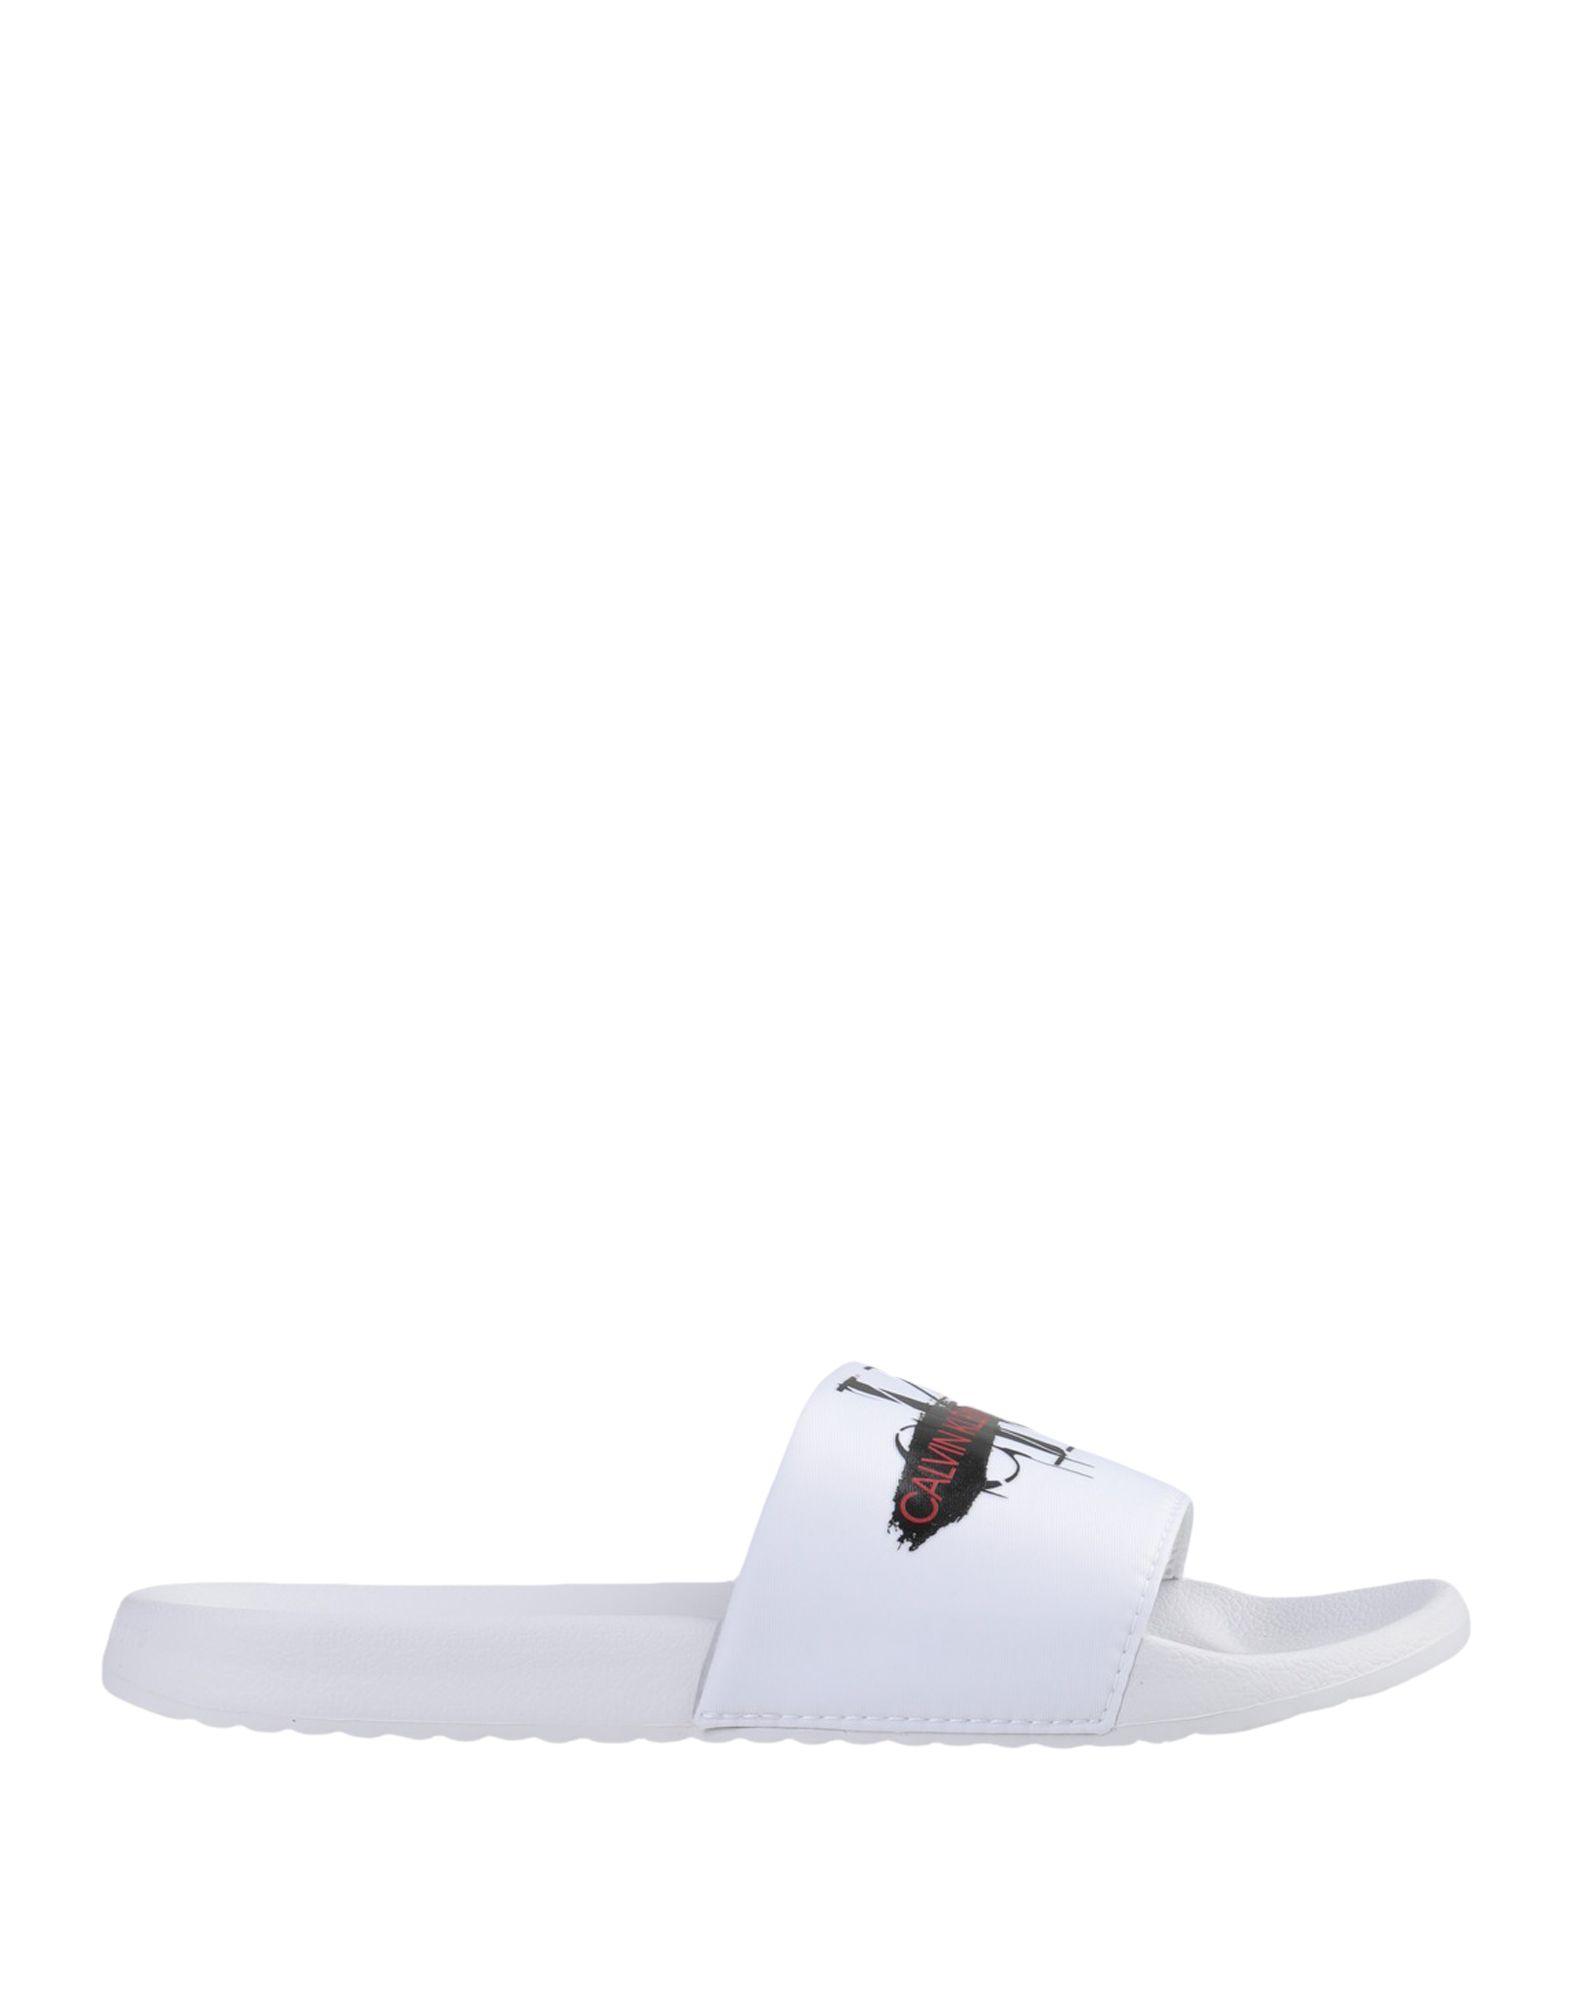 джемпер женский calvin klein jeans цвет серый j20j208528 0390 размер xs 40 42 CALVIN KLEIN JEANS Сандалии